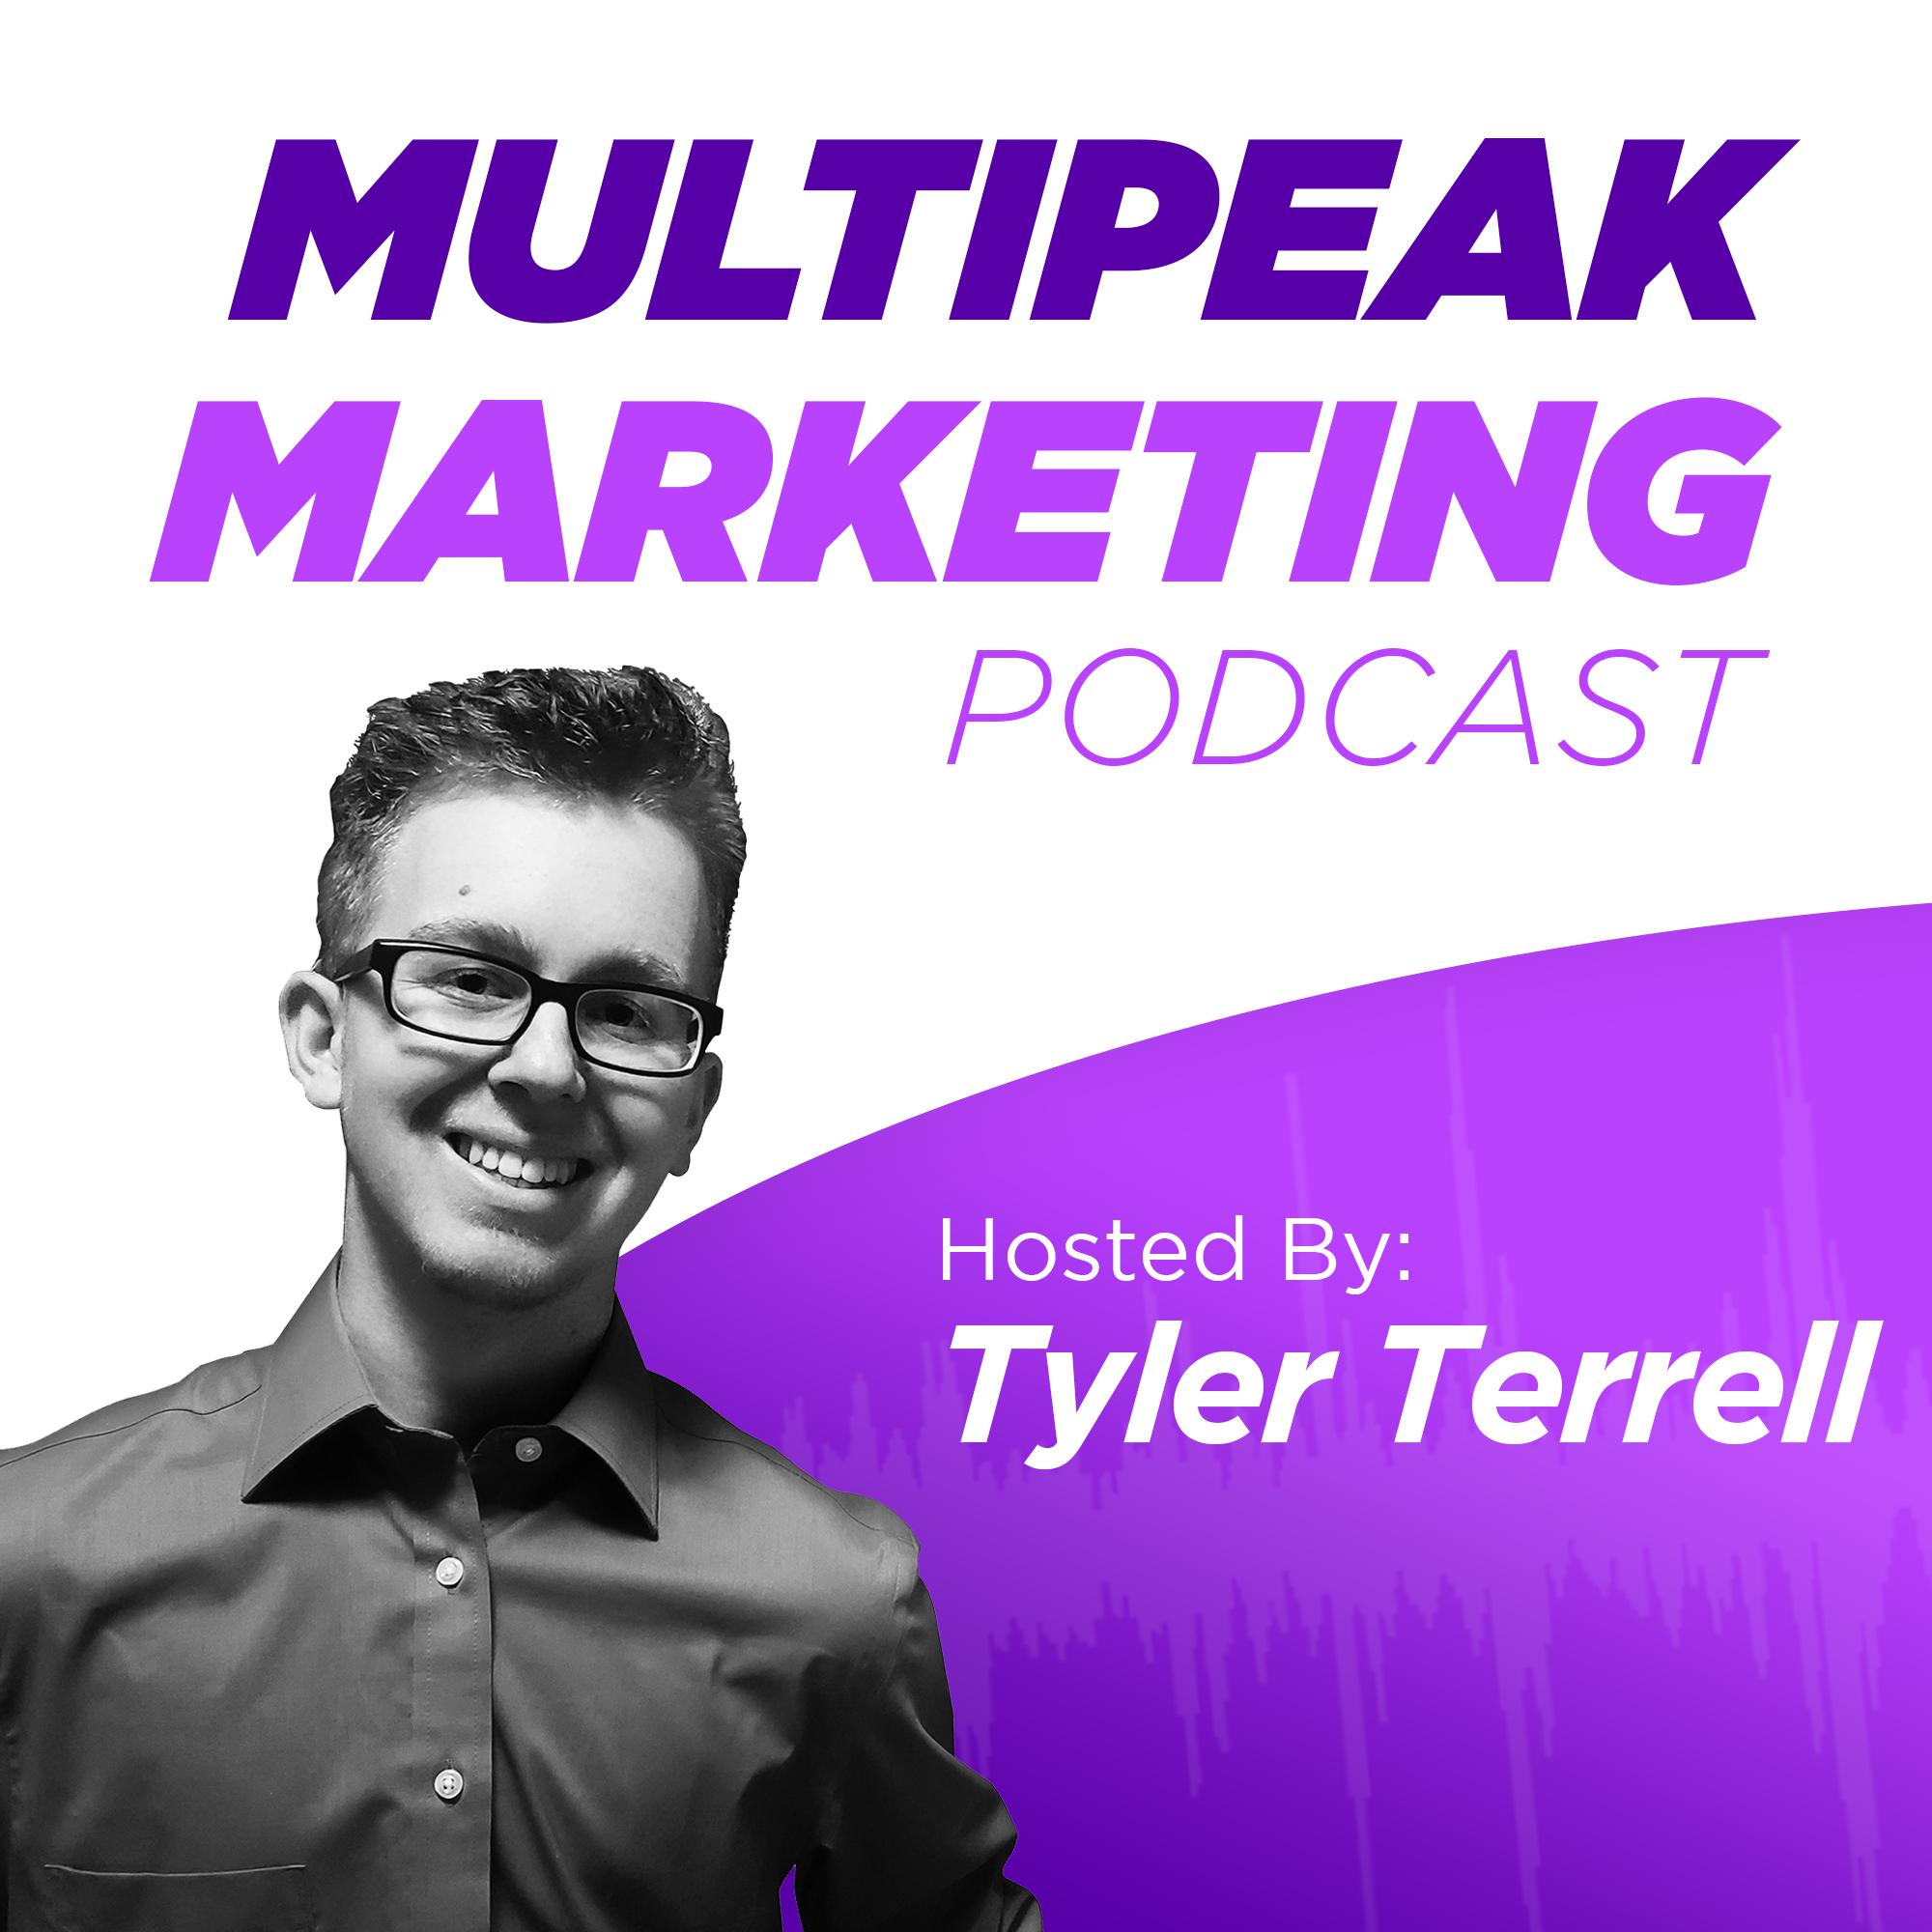 Tracy Martin - Multipeak Marketing Podcast - Episode 2 show art